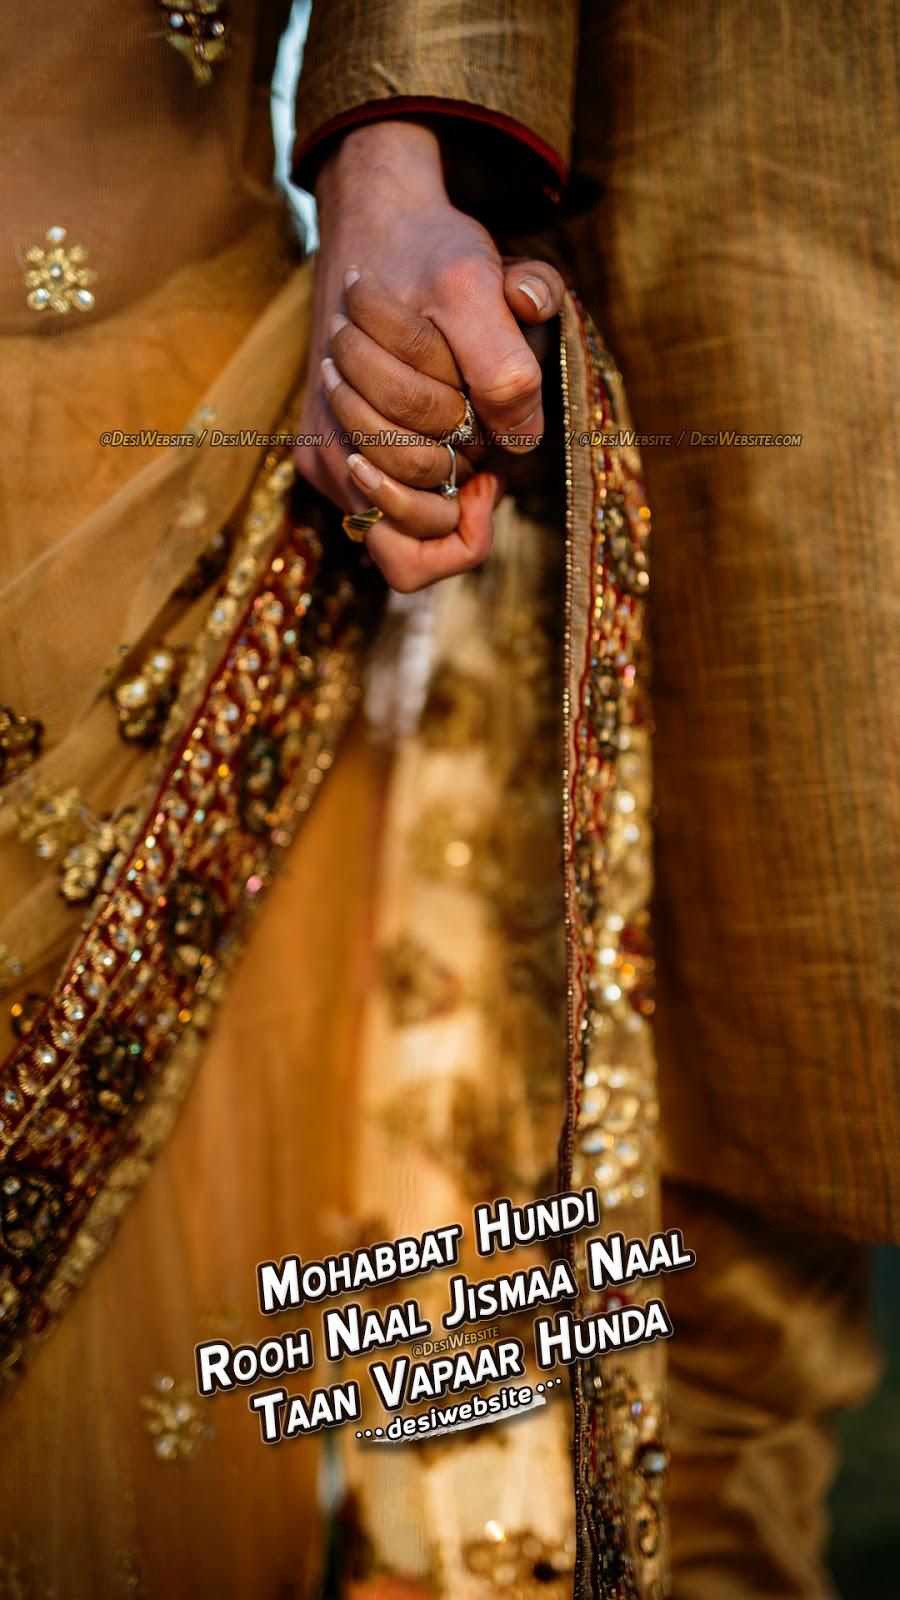 Mohabbat Hundi Rooh Naal - desi website